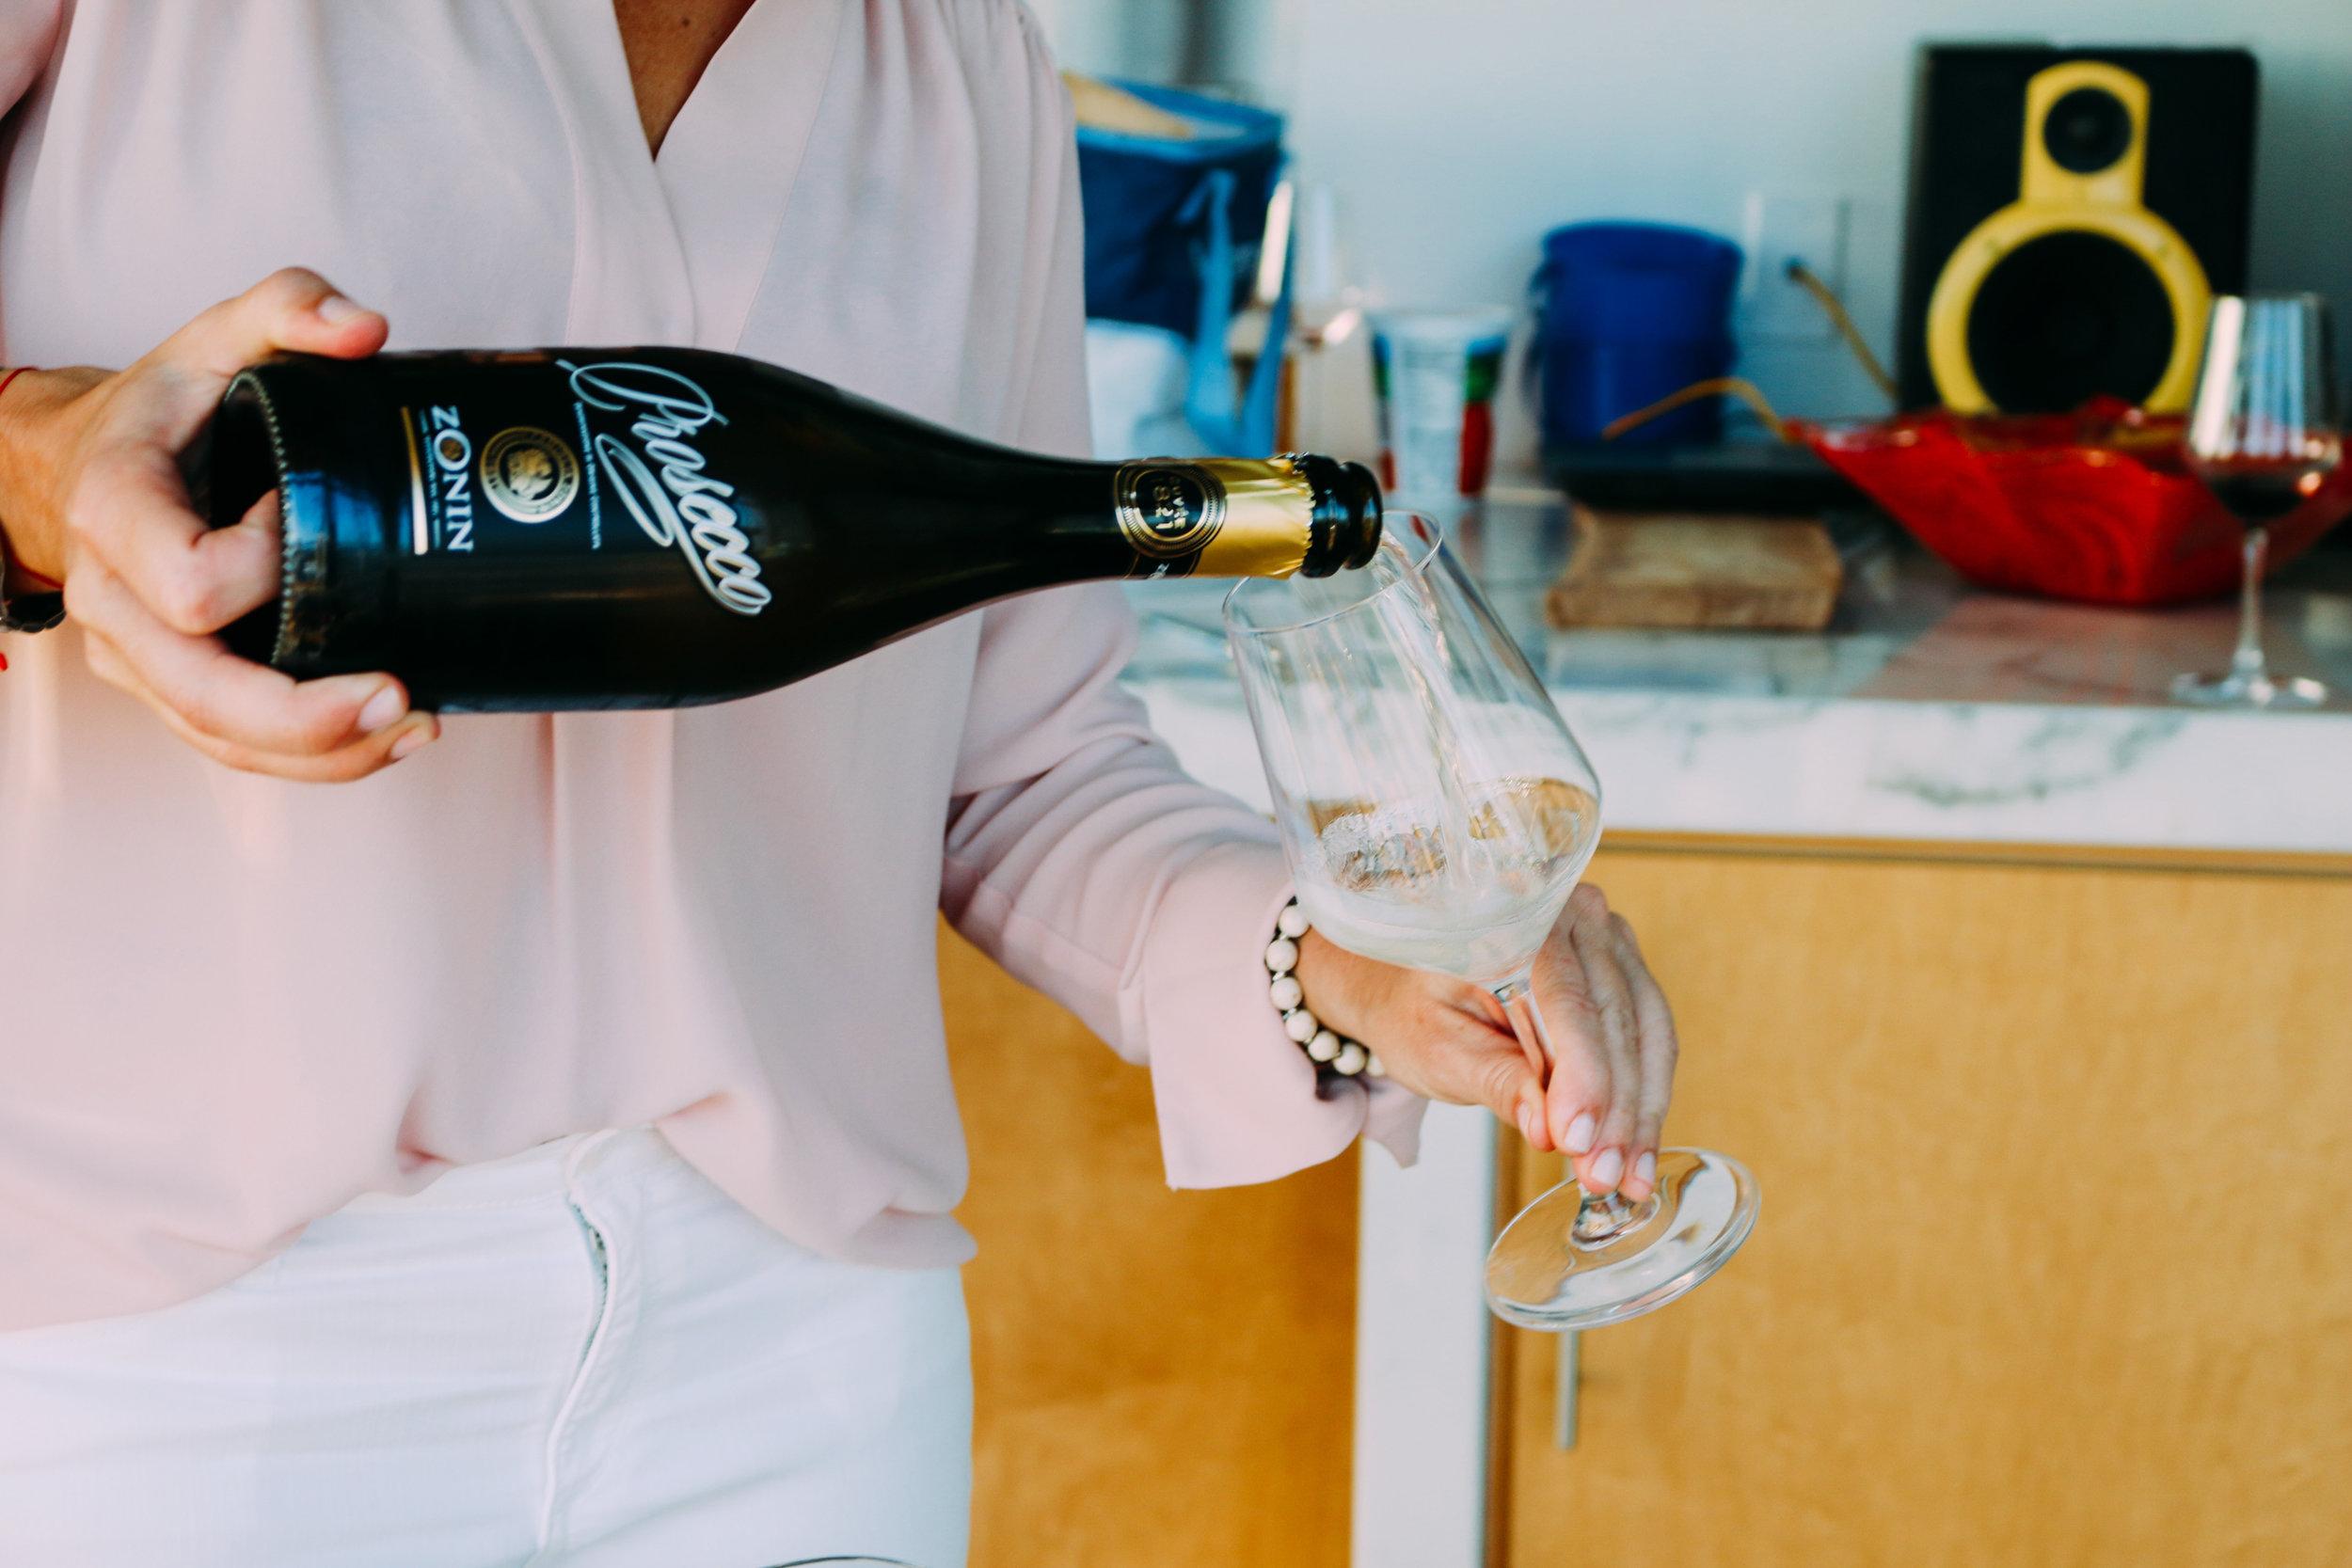 Women Who Wine Uncorked Conversations-Miami Wine Events-Wine Tasting Miami-11.jpg